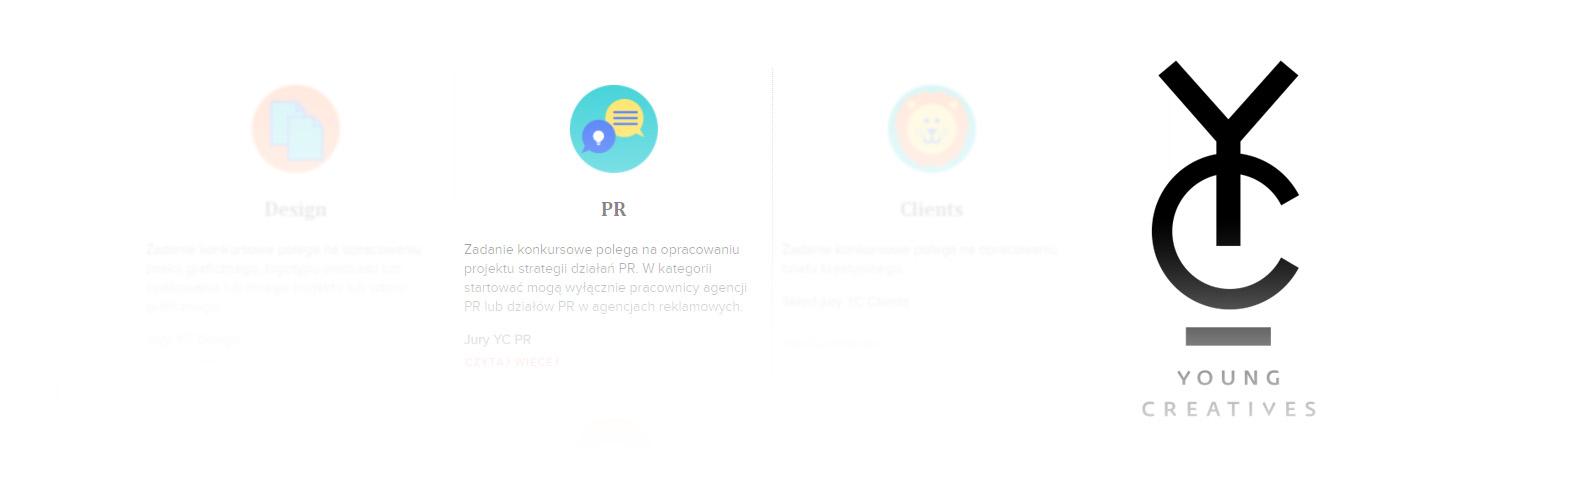 Komentarz teamu On Board Ecco Network startującego wkategorii PR wkonkursie Young Creatives